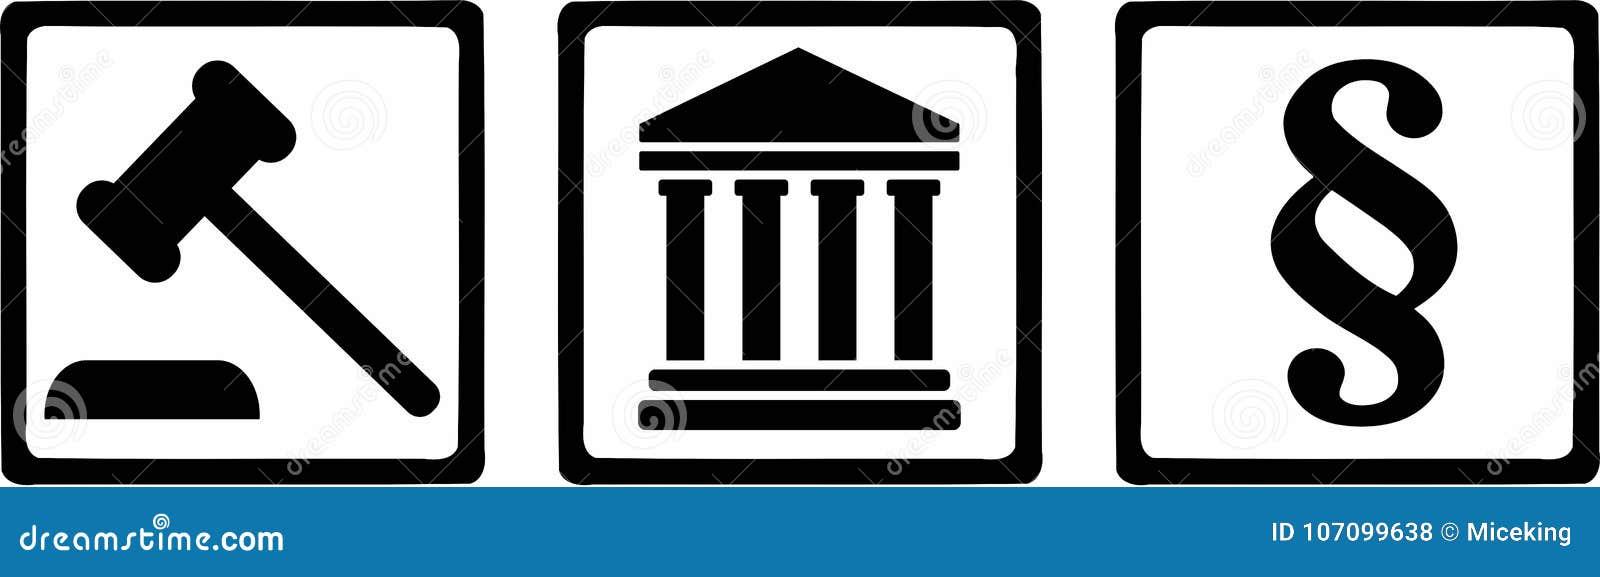 Justice Symbols Law Vector Stock Vector Illustration Of Vector